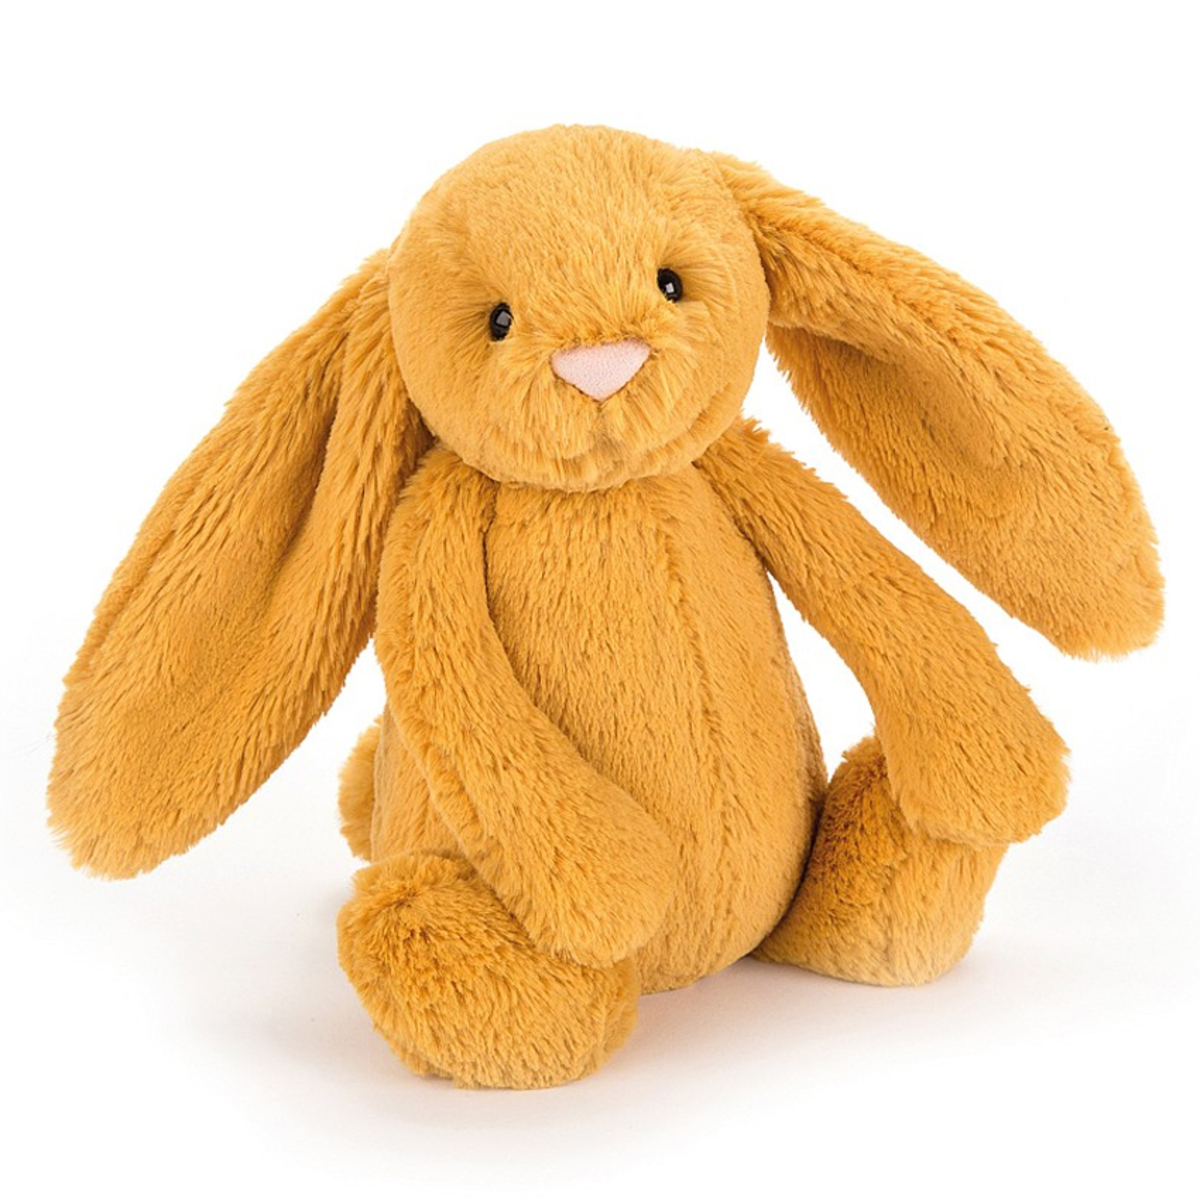 Peluche Bashful Saffron Bunny - Medium Peluche Lapin 31 cm